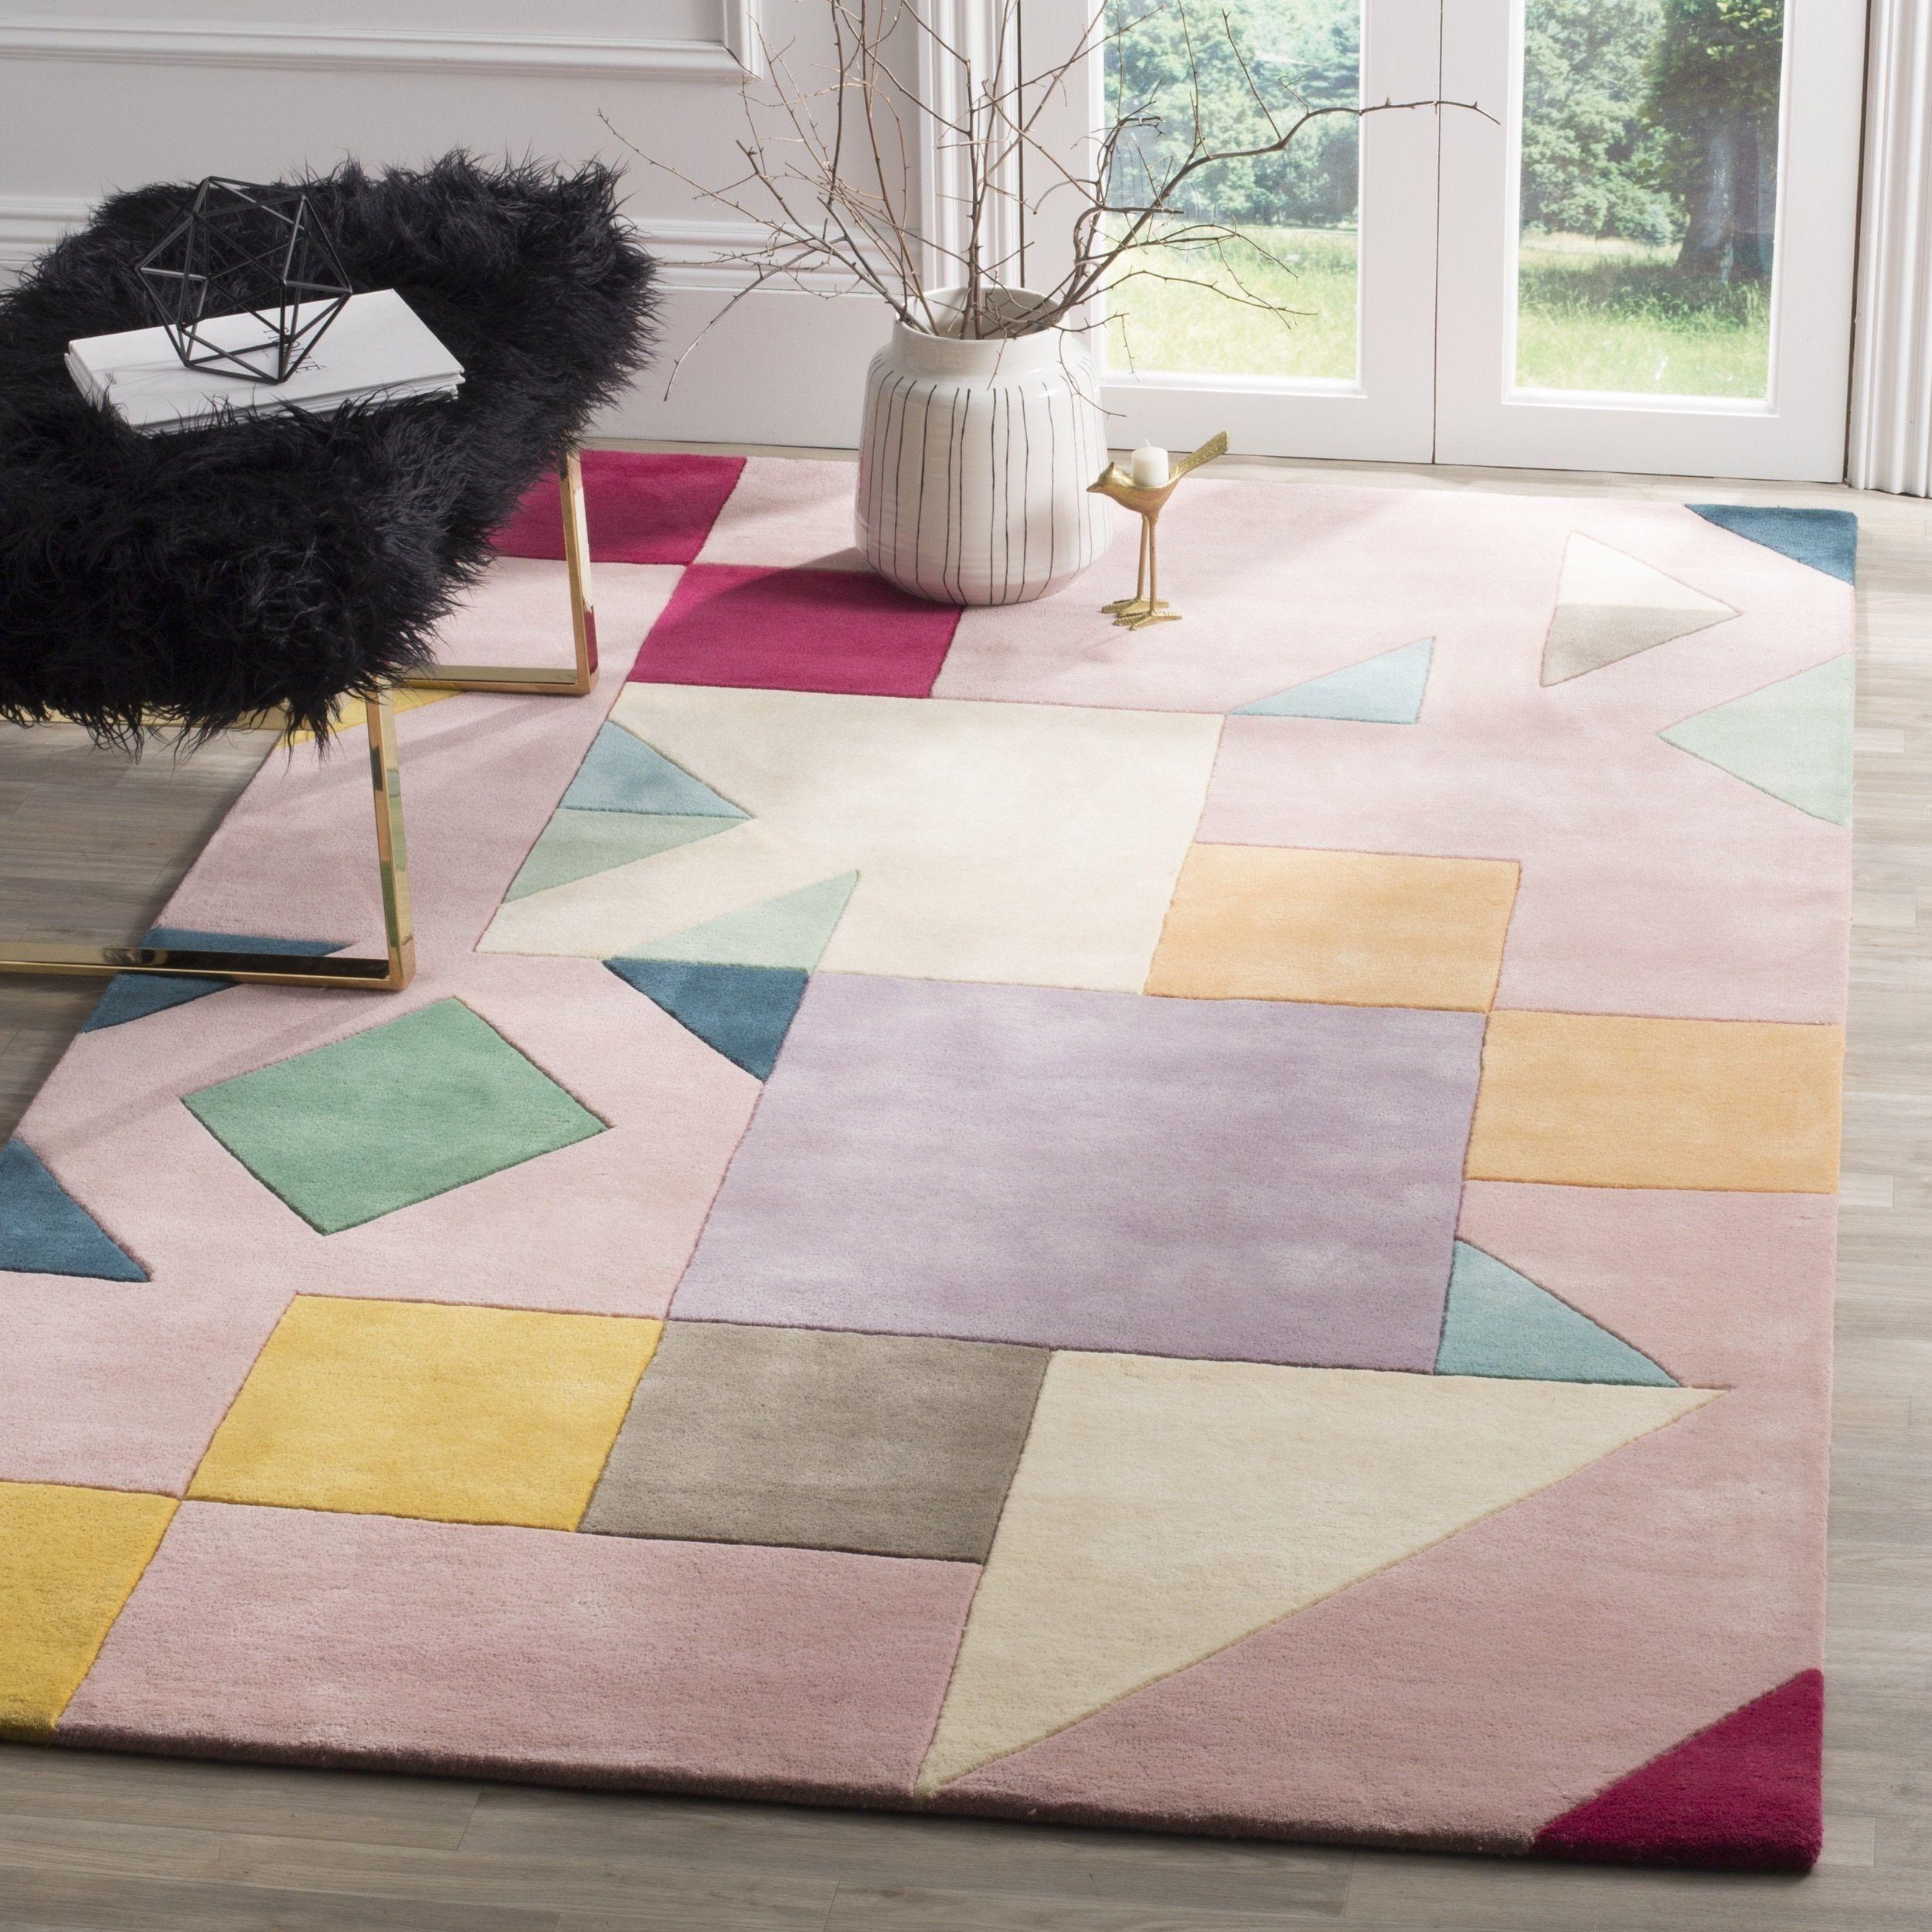 Safavieh Fifth Avenue Hand Woven New Zealand Wool Pink Multi Area Rug 4